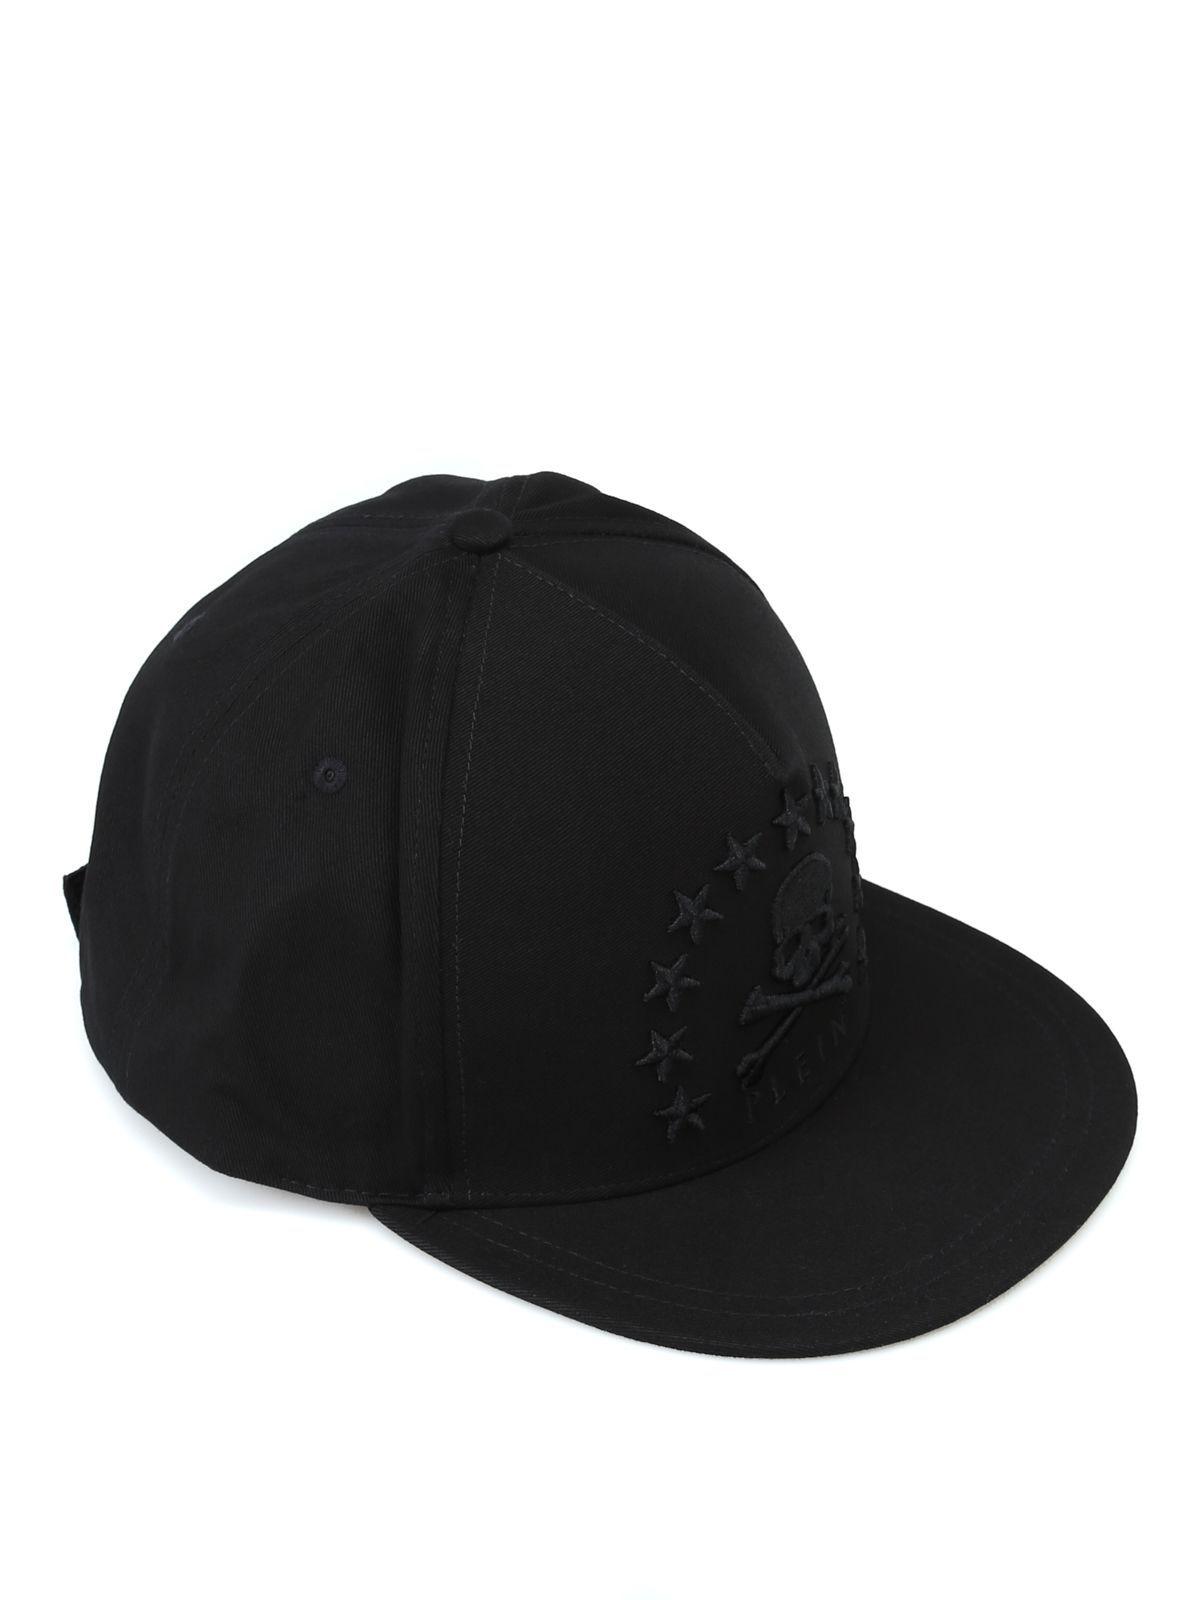 41b9ebfc1a6 PHILIPP PLEIN BASEBALL CAP